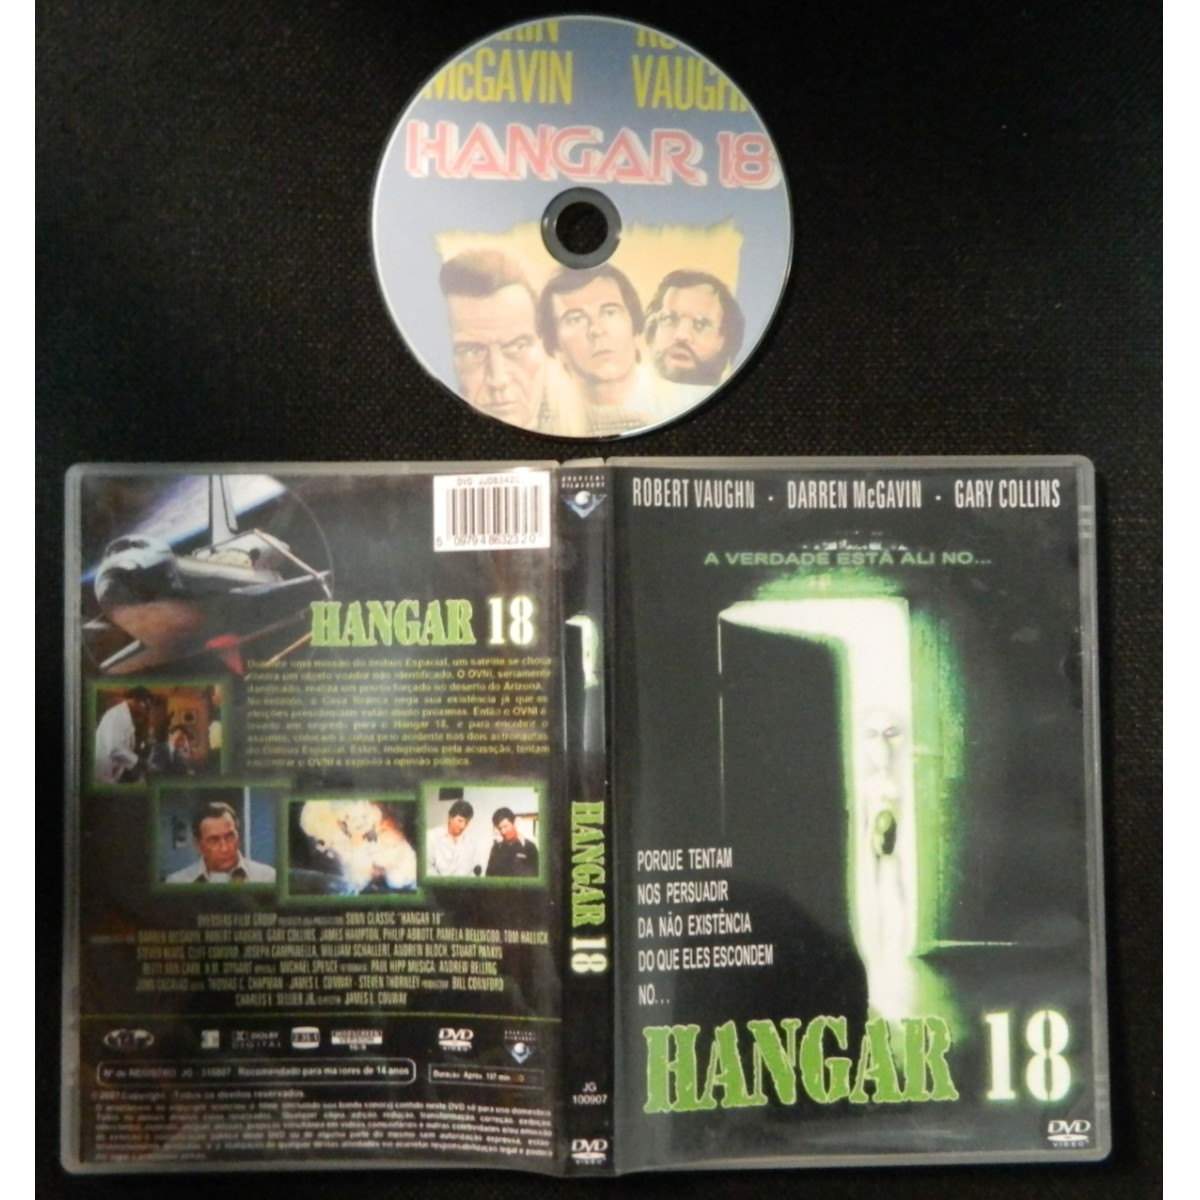 Dvd Hangar 18 - 1980 [ Roswell]   - FILMES RAROS EM DVD